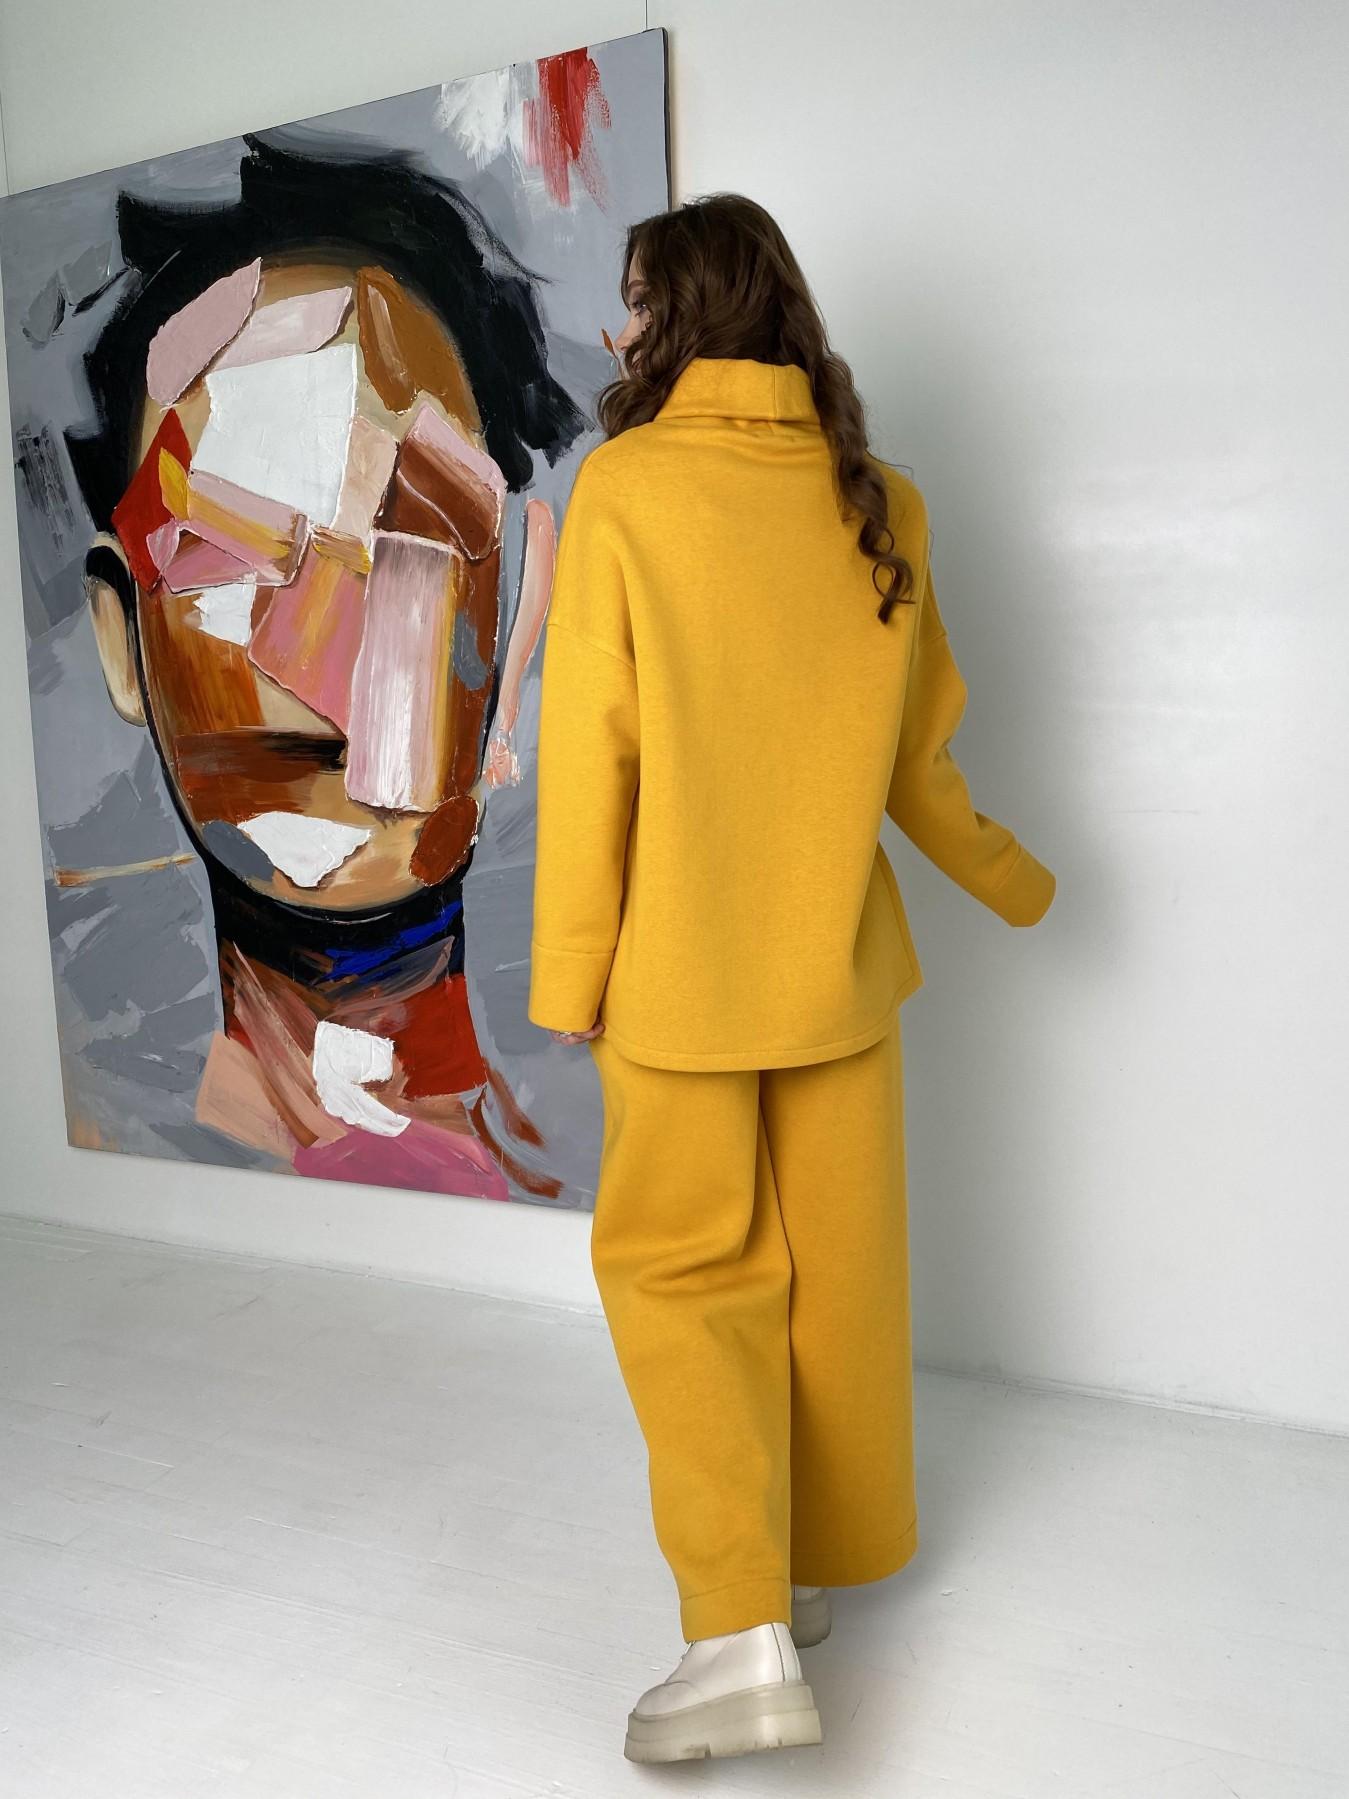 Джаст костюм на флисе 3х нитка 10513 АРТ. 47077 Цвет: Горчица - фото 10, интернет магазин tm-modus.ru